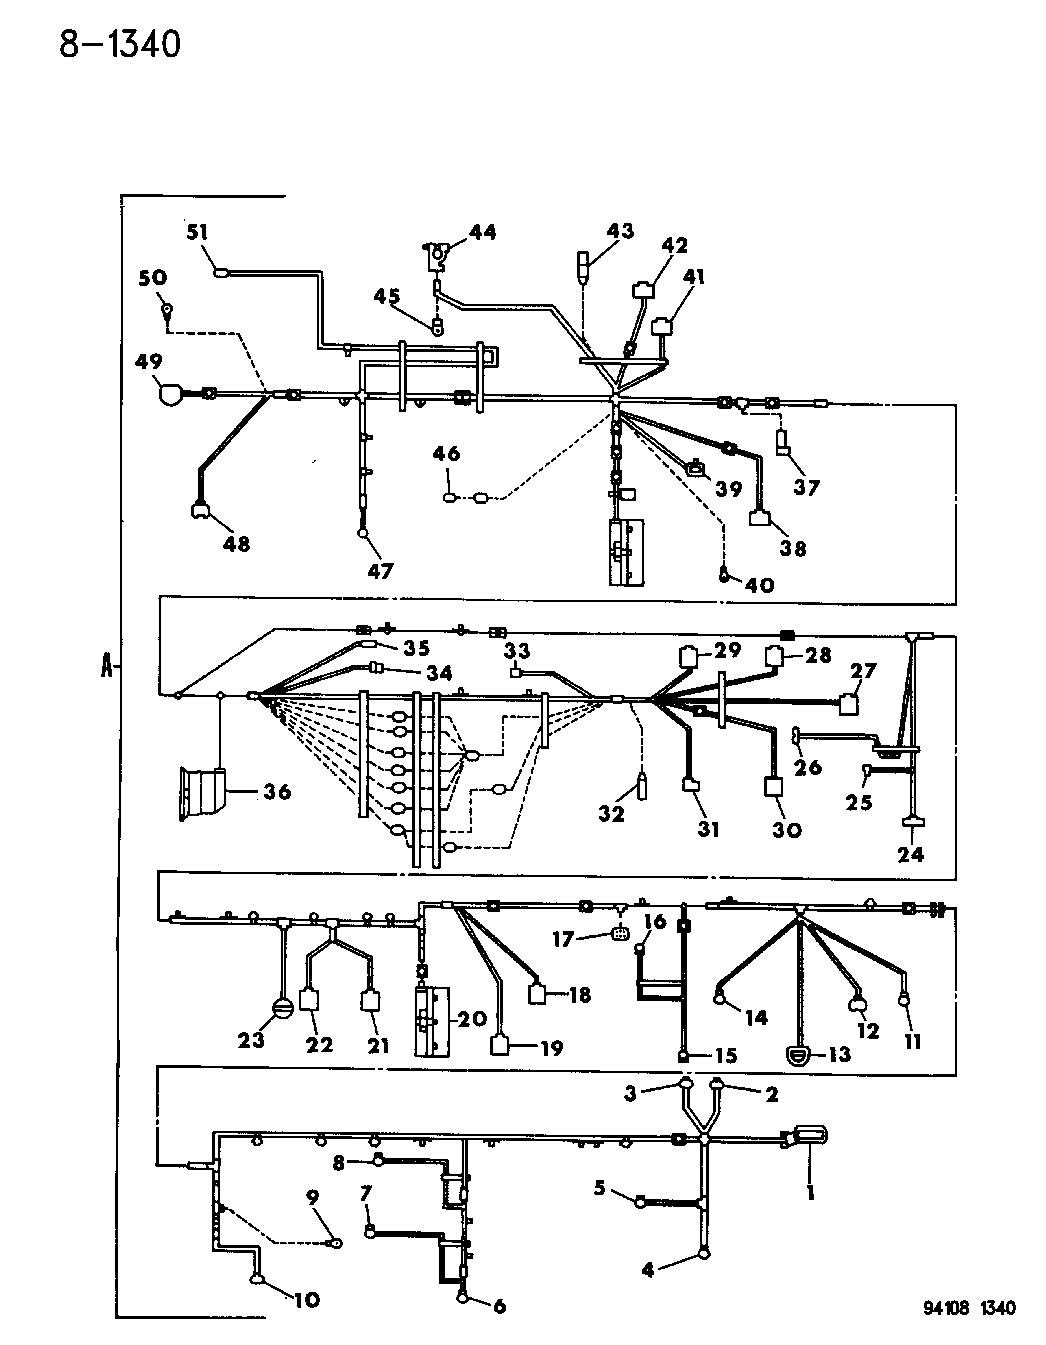 1995 Dodge Grand Caravan Wiring Diagram Razor Battery Wiring Diagram Goldwings Ab18 Jeanjaures37 Fr